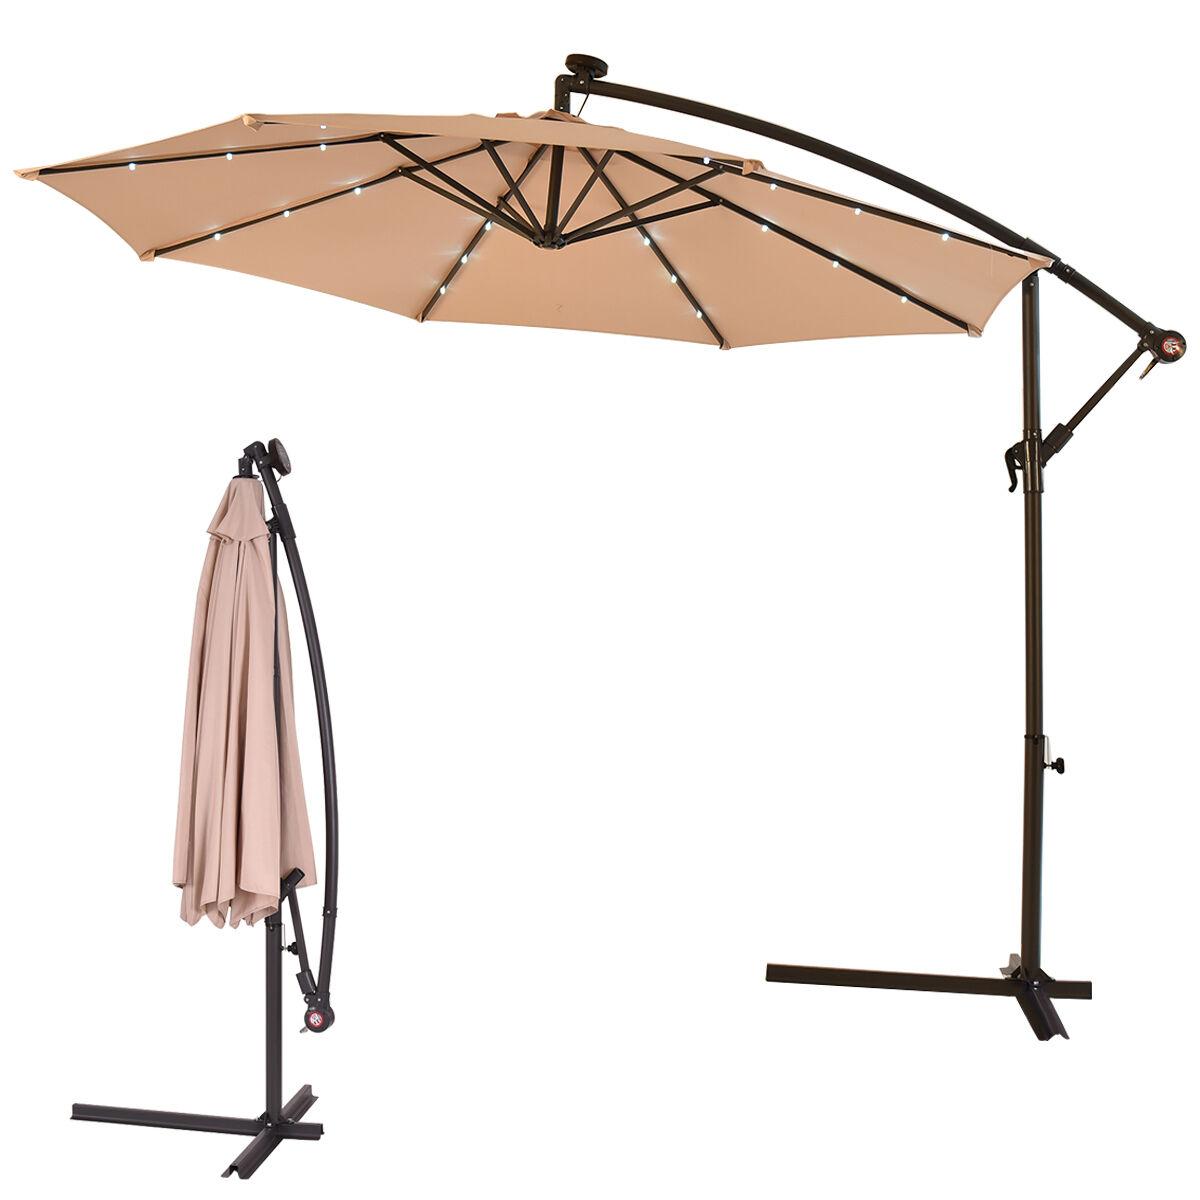 outdoor 10 39 led hanging solar umbrella patio sun shade offset market use w base ebay. Black Bedroom Furniture Sets. Home Design Ideas